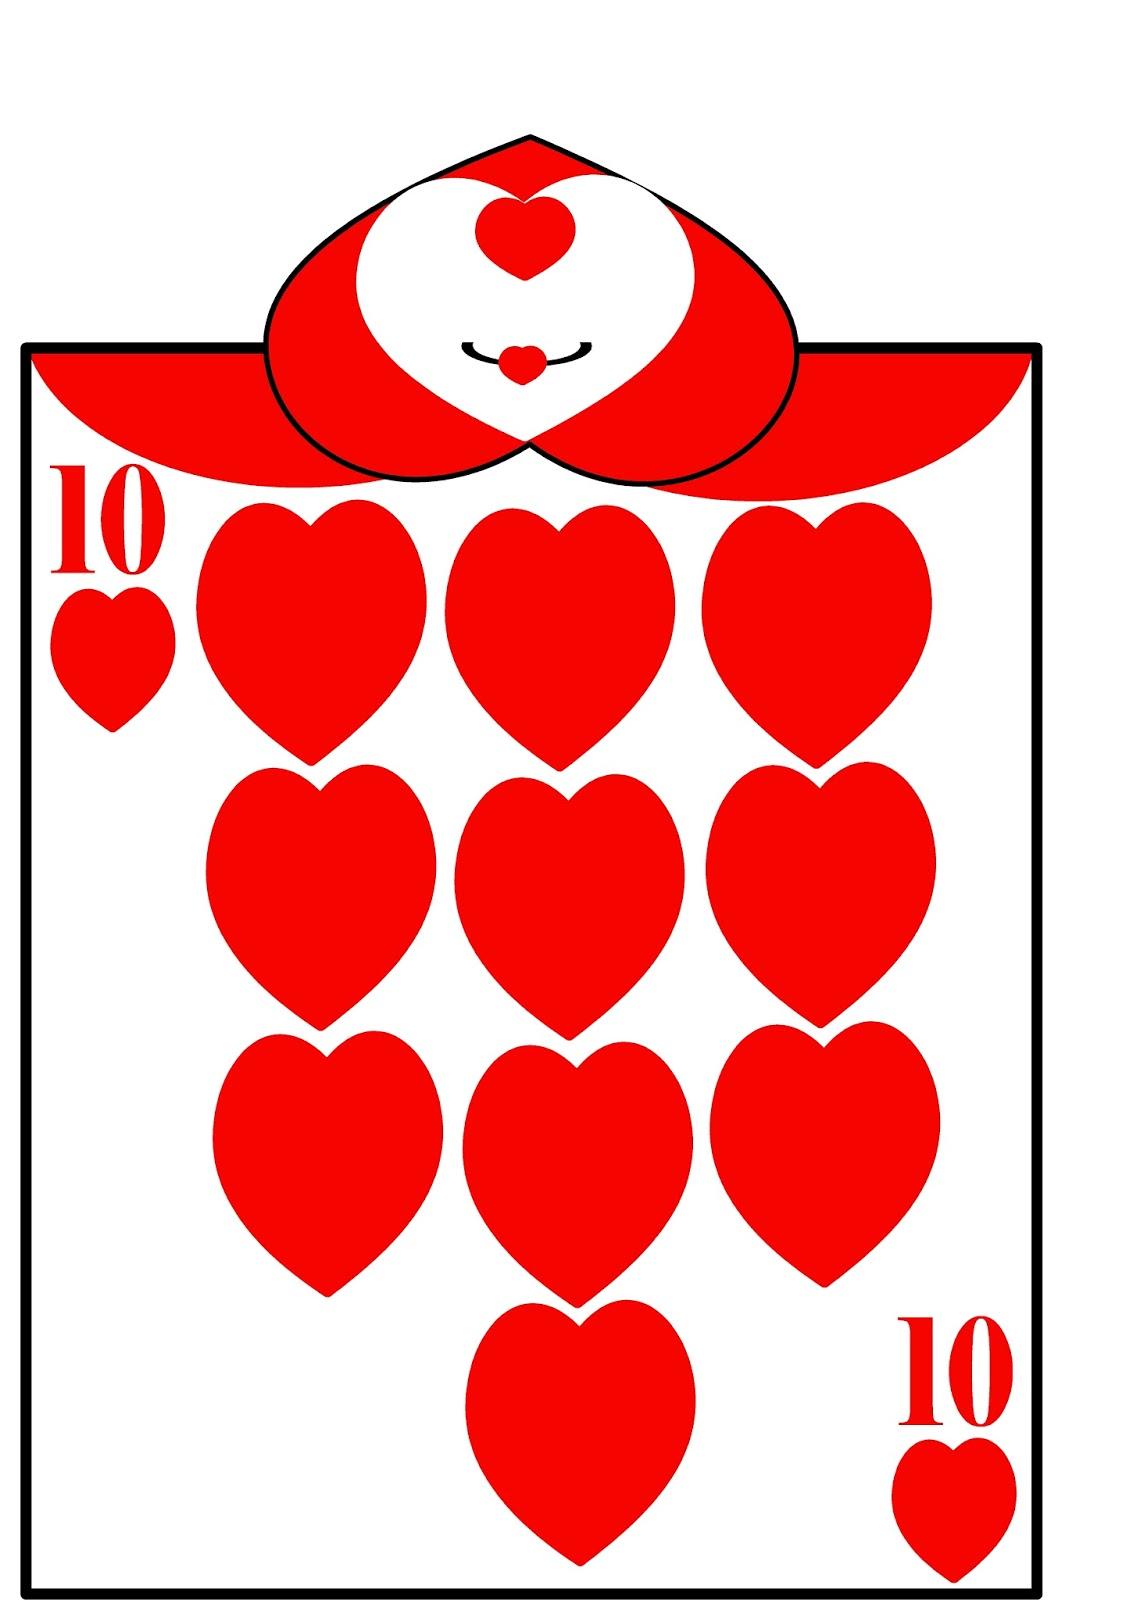 HollysHome Family Life: Alice in Wonderland Card Soldiers - Free With Alice In Wonderland Card Soldiers Template